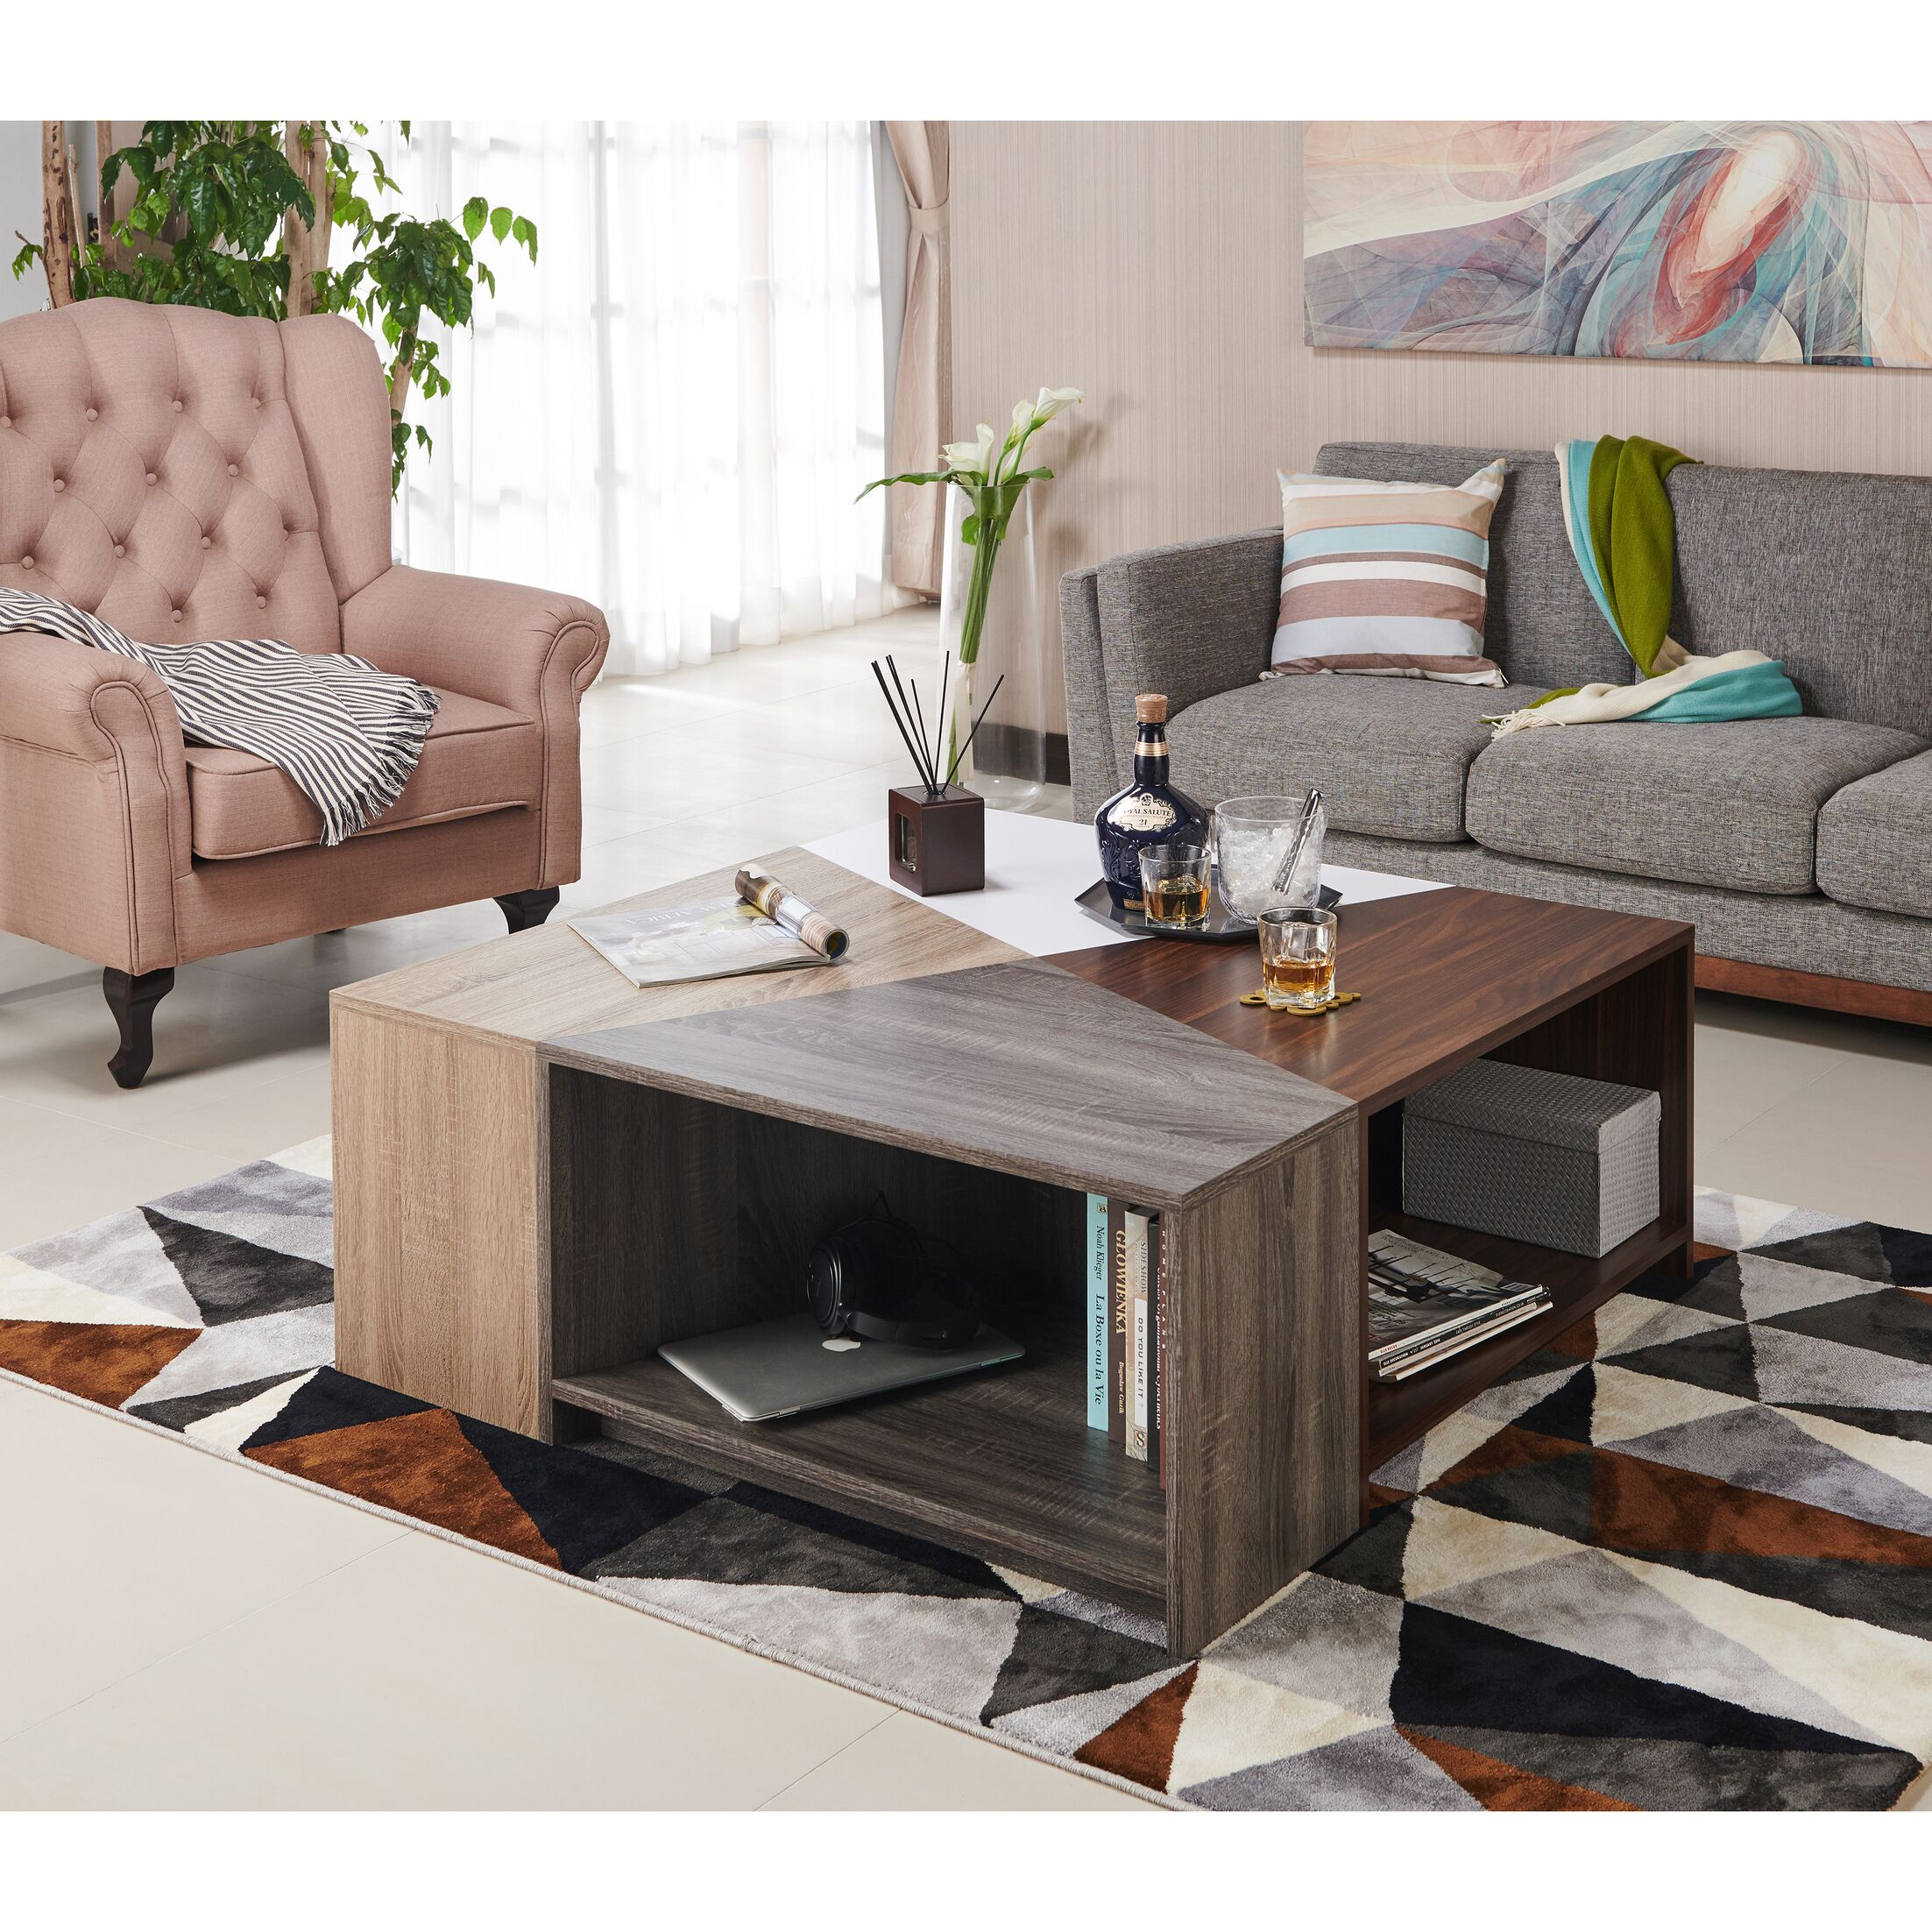 Hieronymus Modern Modular Coffee Table